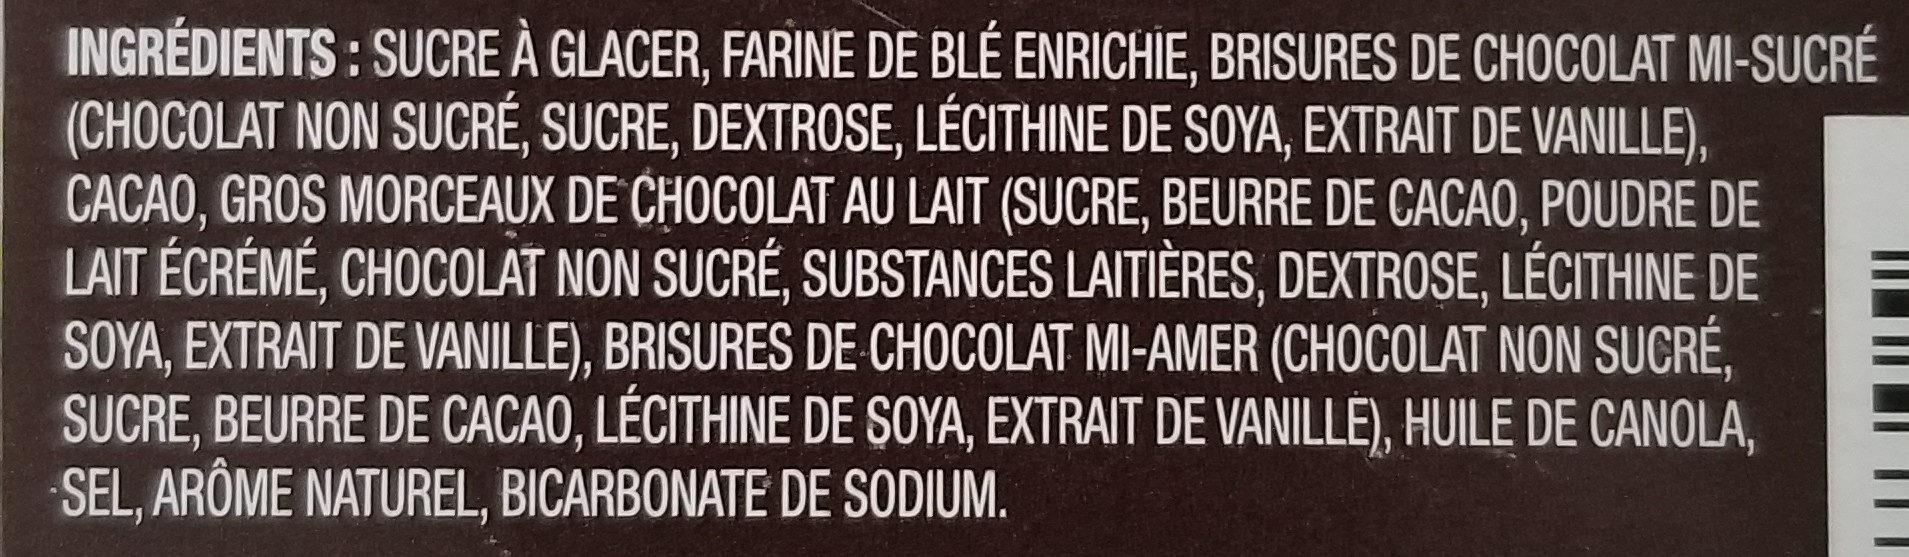 mélange à brownies triple chocolat - Ingrediënten - fr